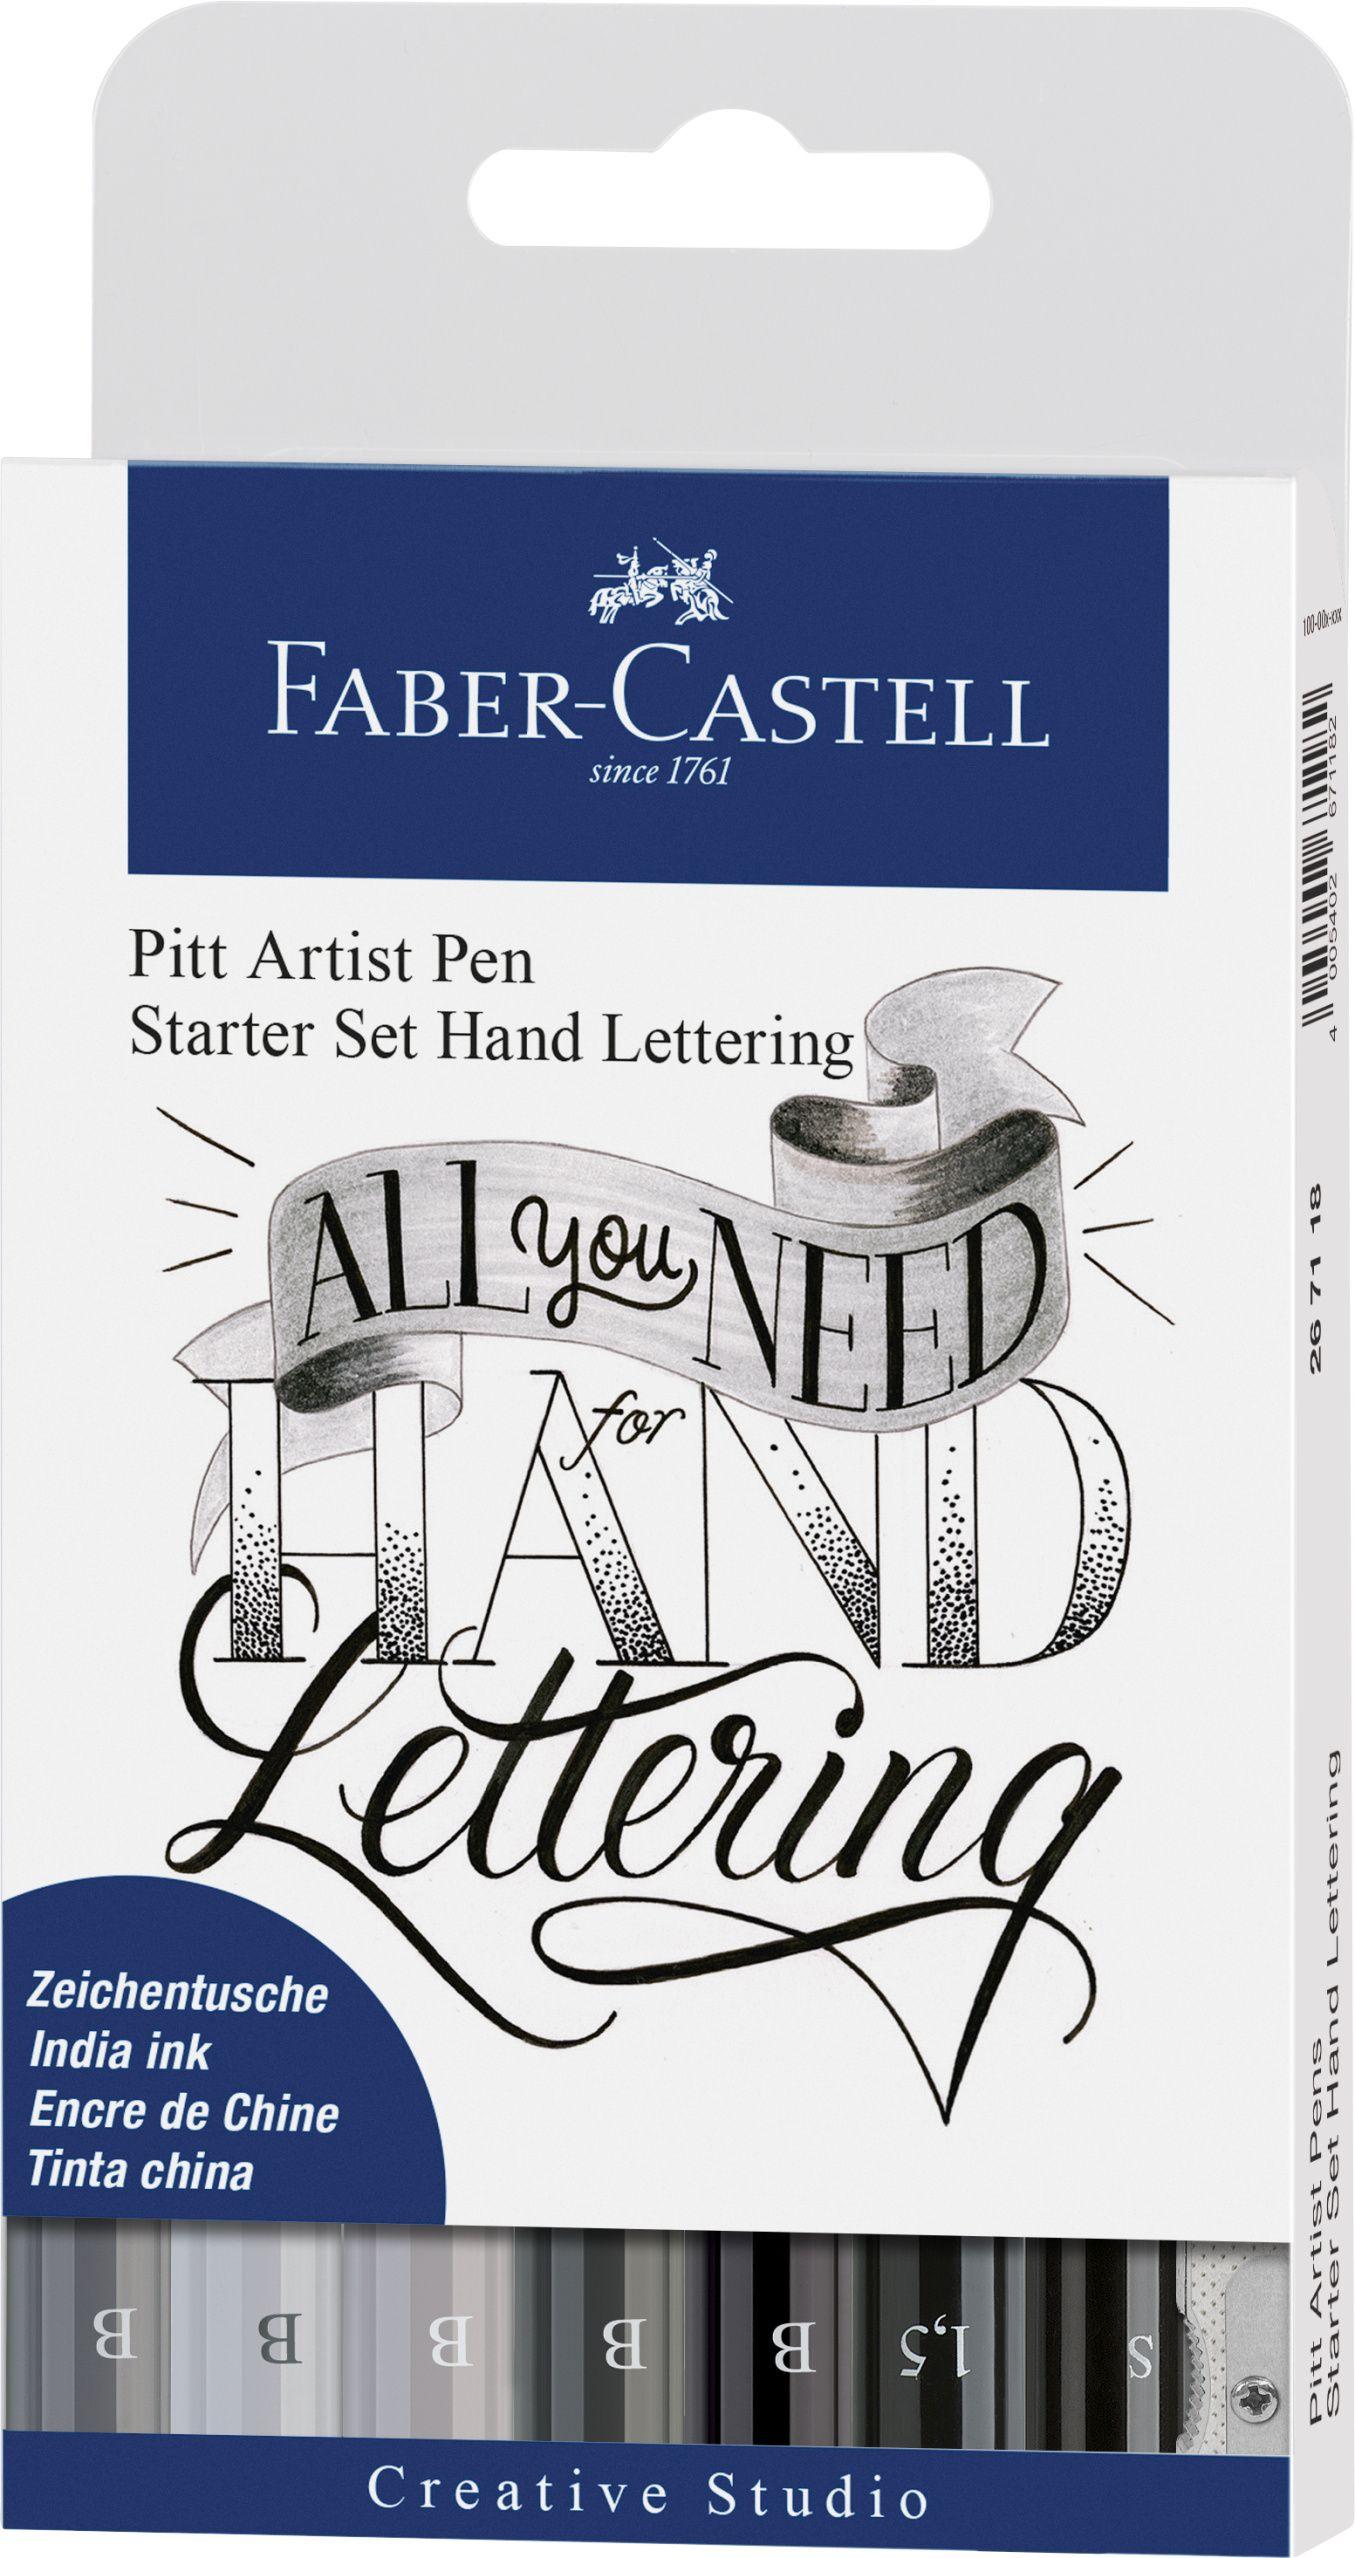 Zestaw Startowy Faber Castell Hand Lettering Aukcja